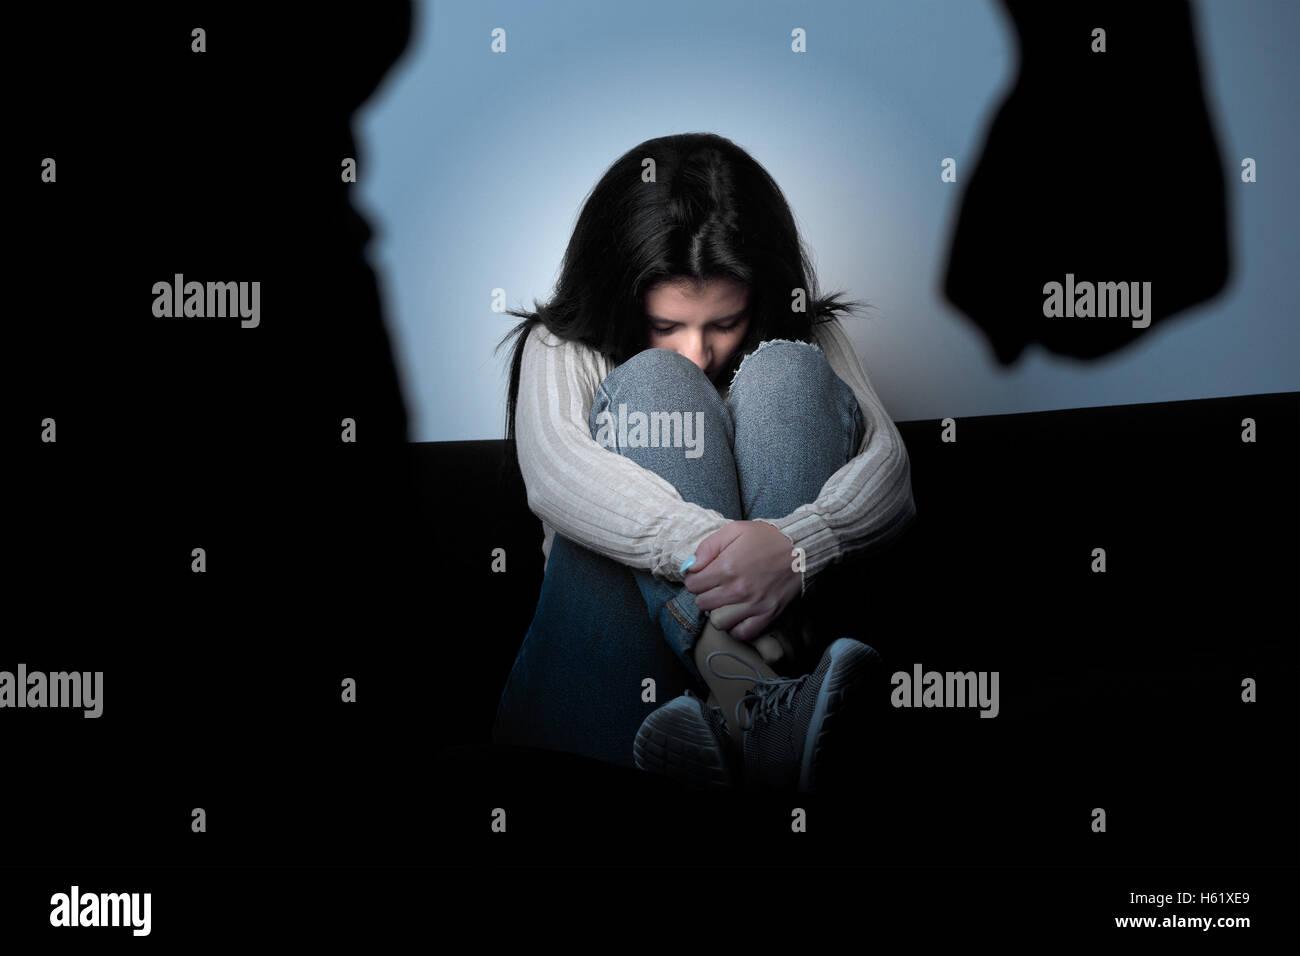 Violent husband abusing wife - Stock Image